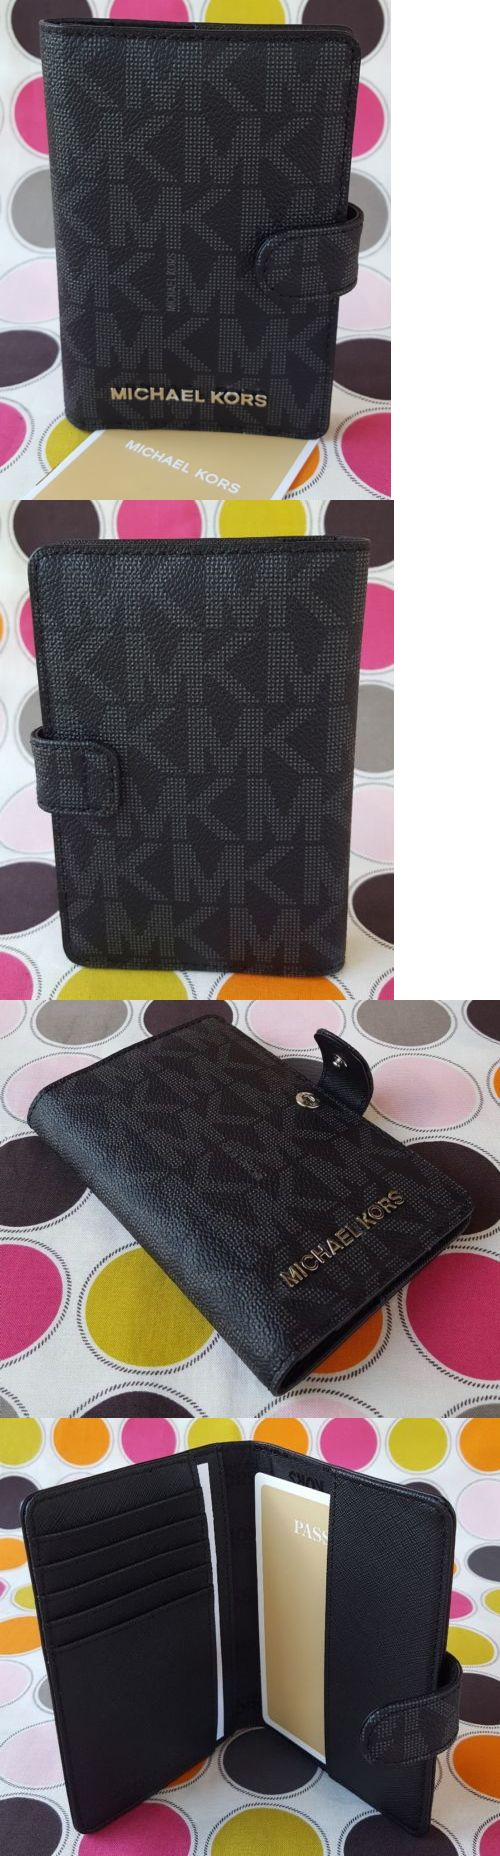 Passport Holders 169288: New Michael Kors Signature Pvc Jet Set Travel Passport Holder Wallet In Black. -> BUY IT NOW ONLY: $62 on eBay!